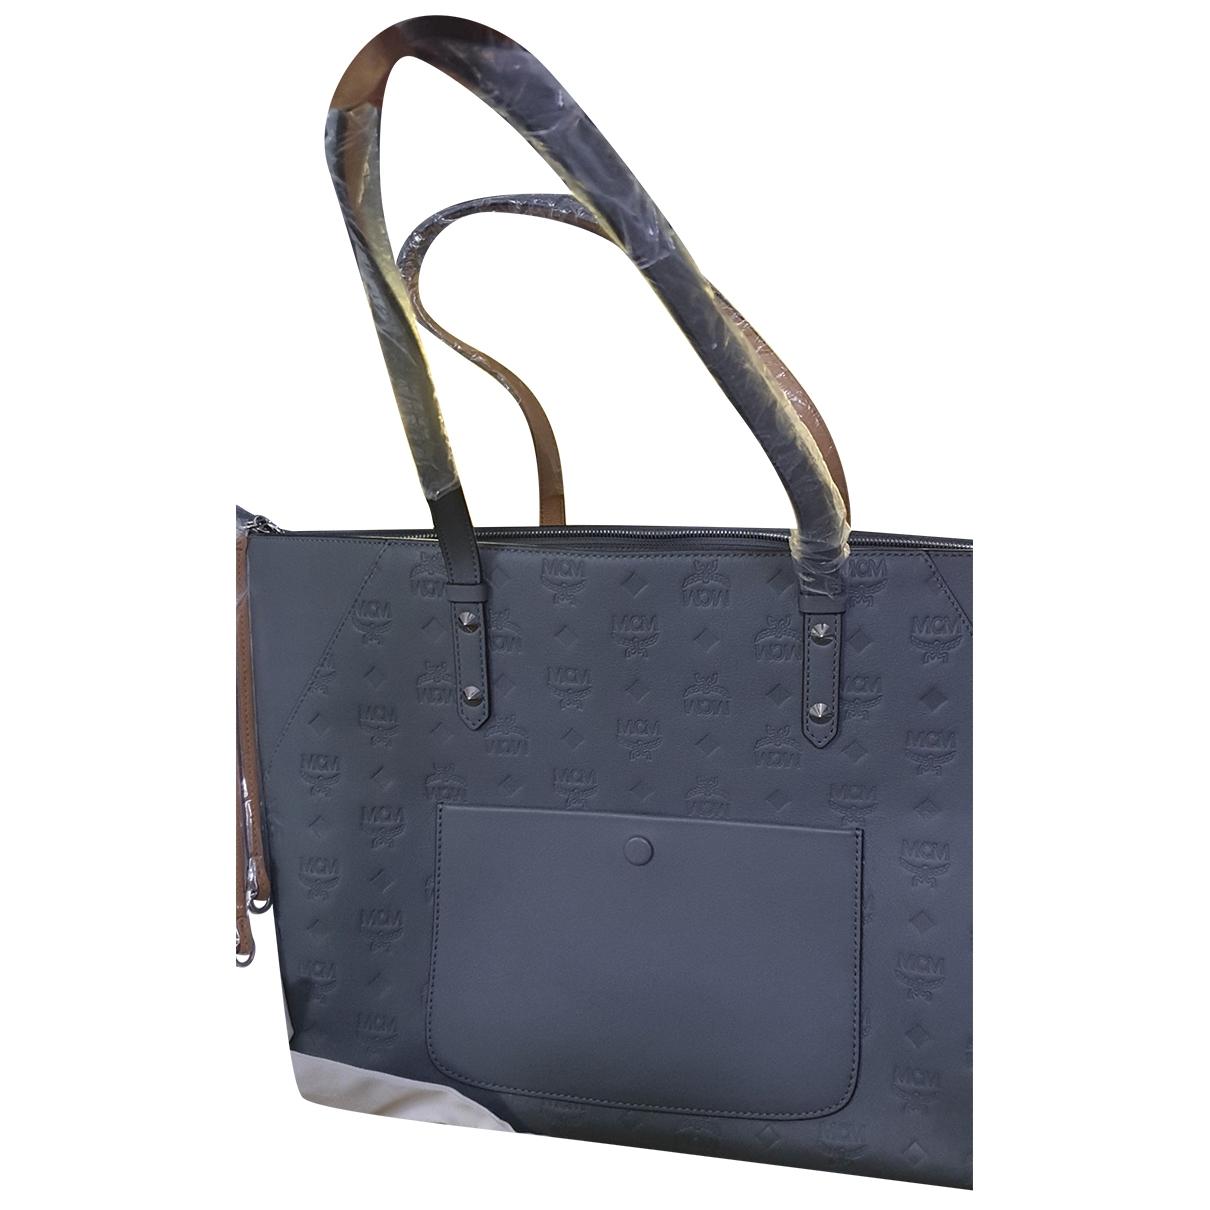 Mcm \N Grey Leather handbag for Women \N